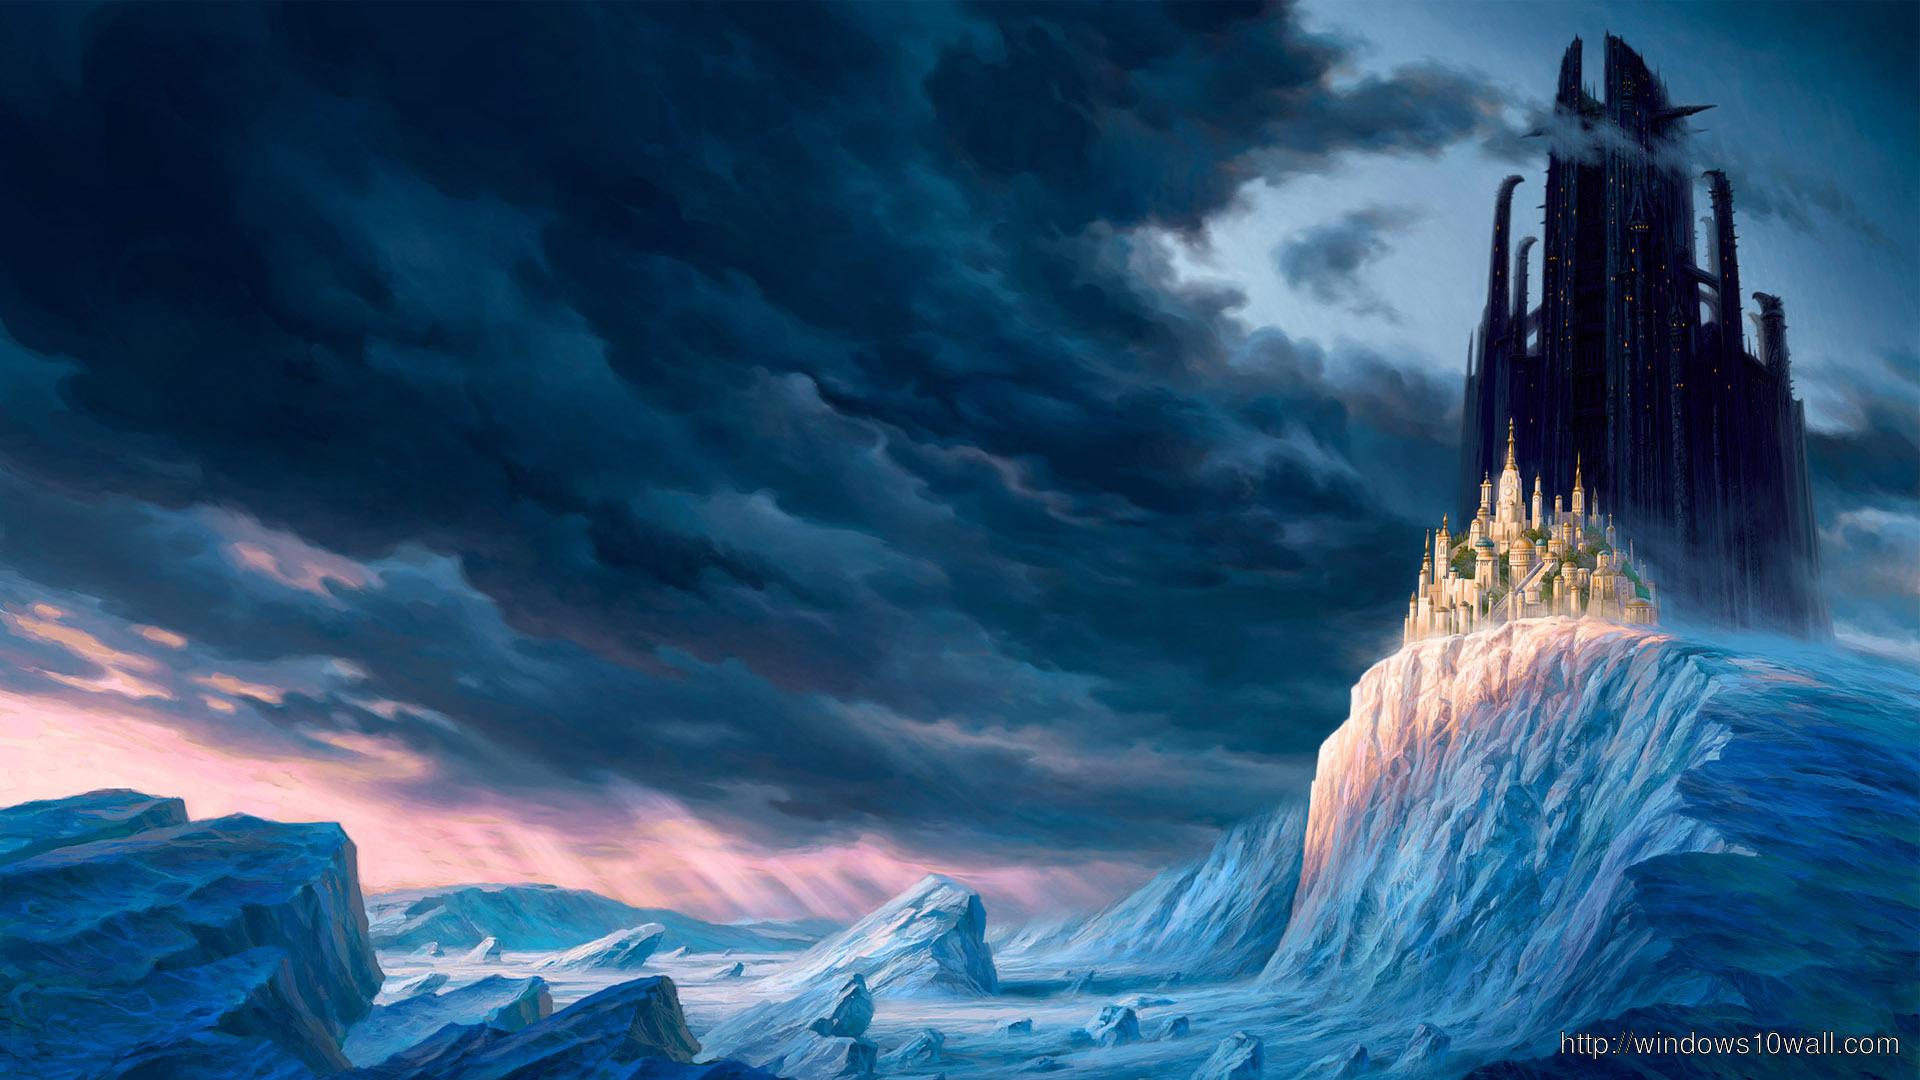 Castle Full Hd Wallpapers Download 1080p Desktop Backgrounds Windows 10 Wallpapers